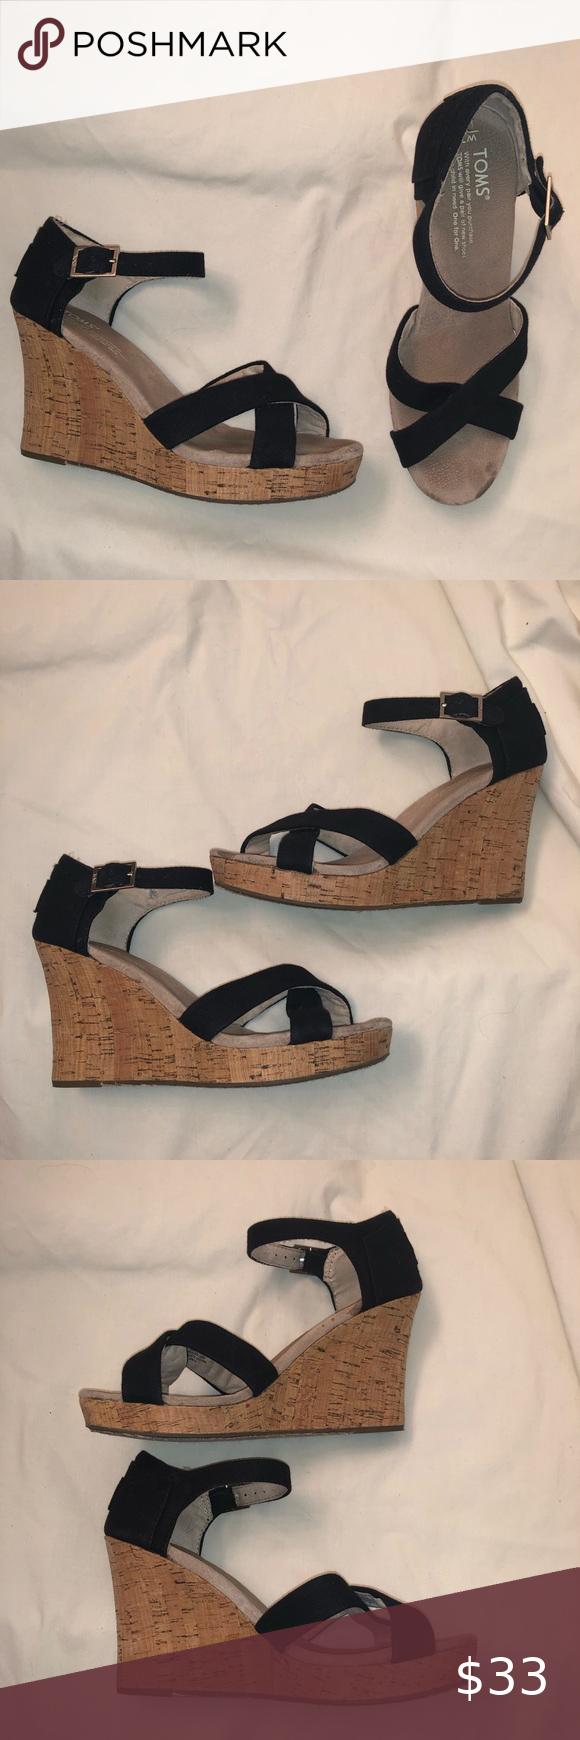 TOMS sienna wedge sandals in black size